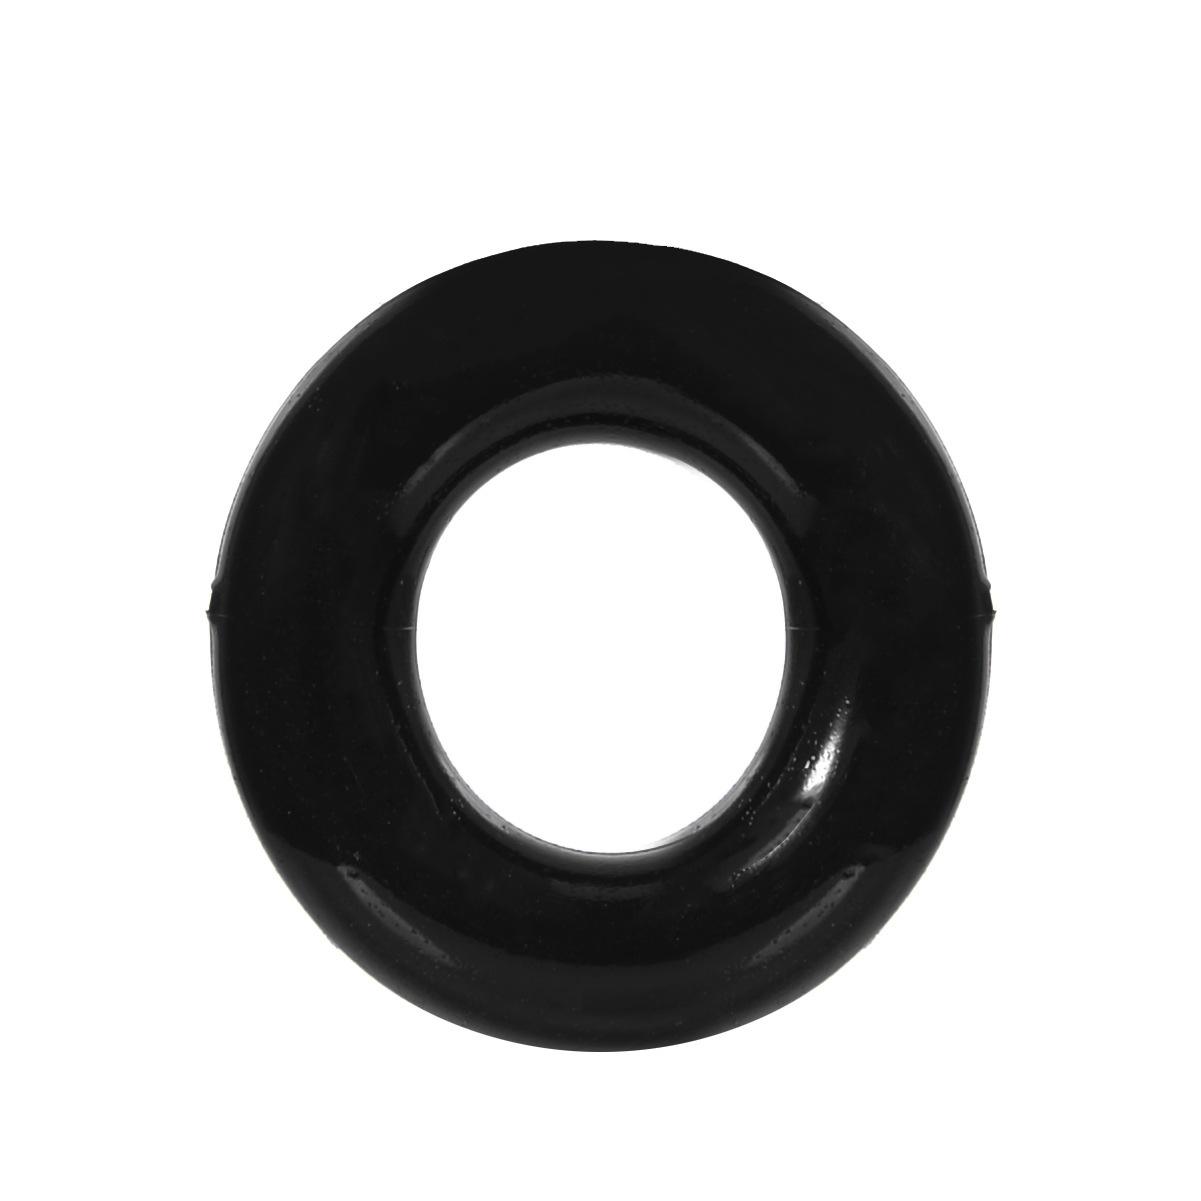 Cock Ring Penis Ring for Long Pleasure